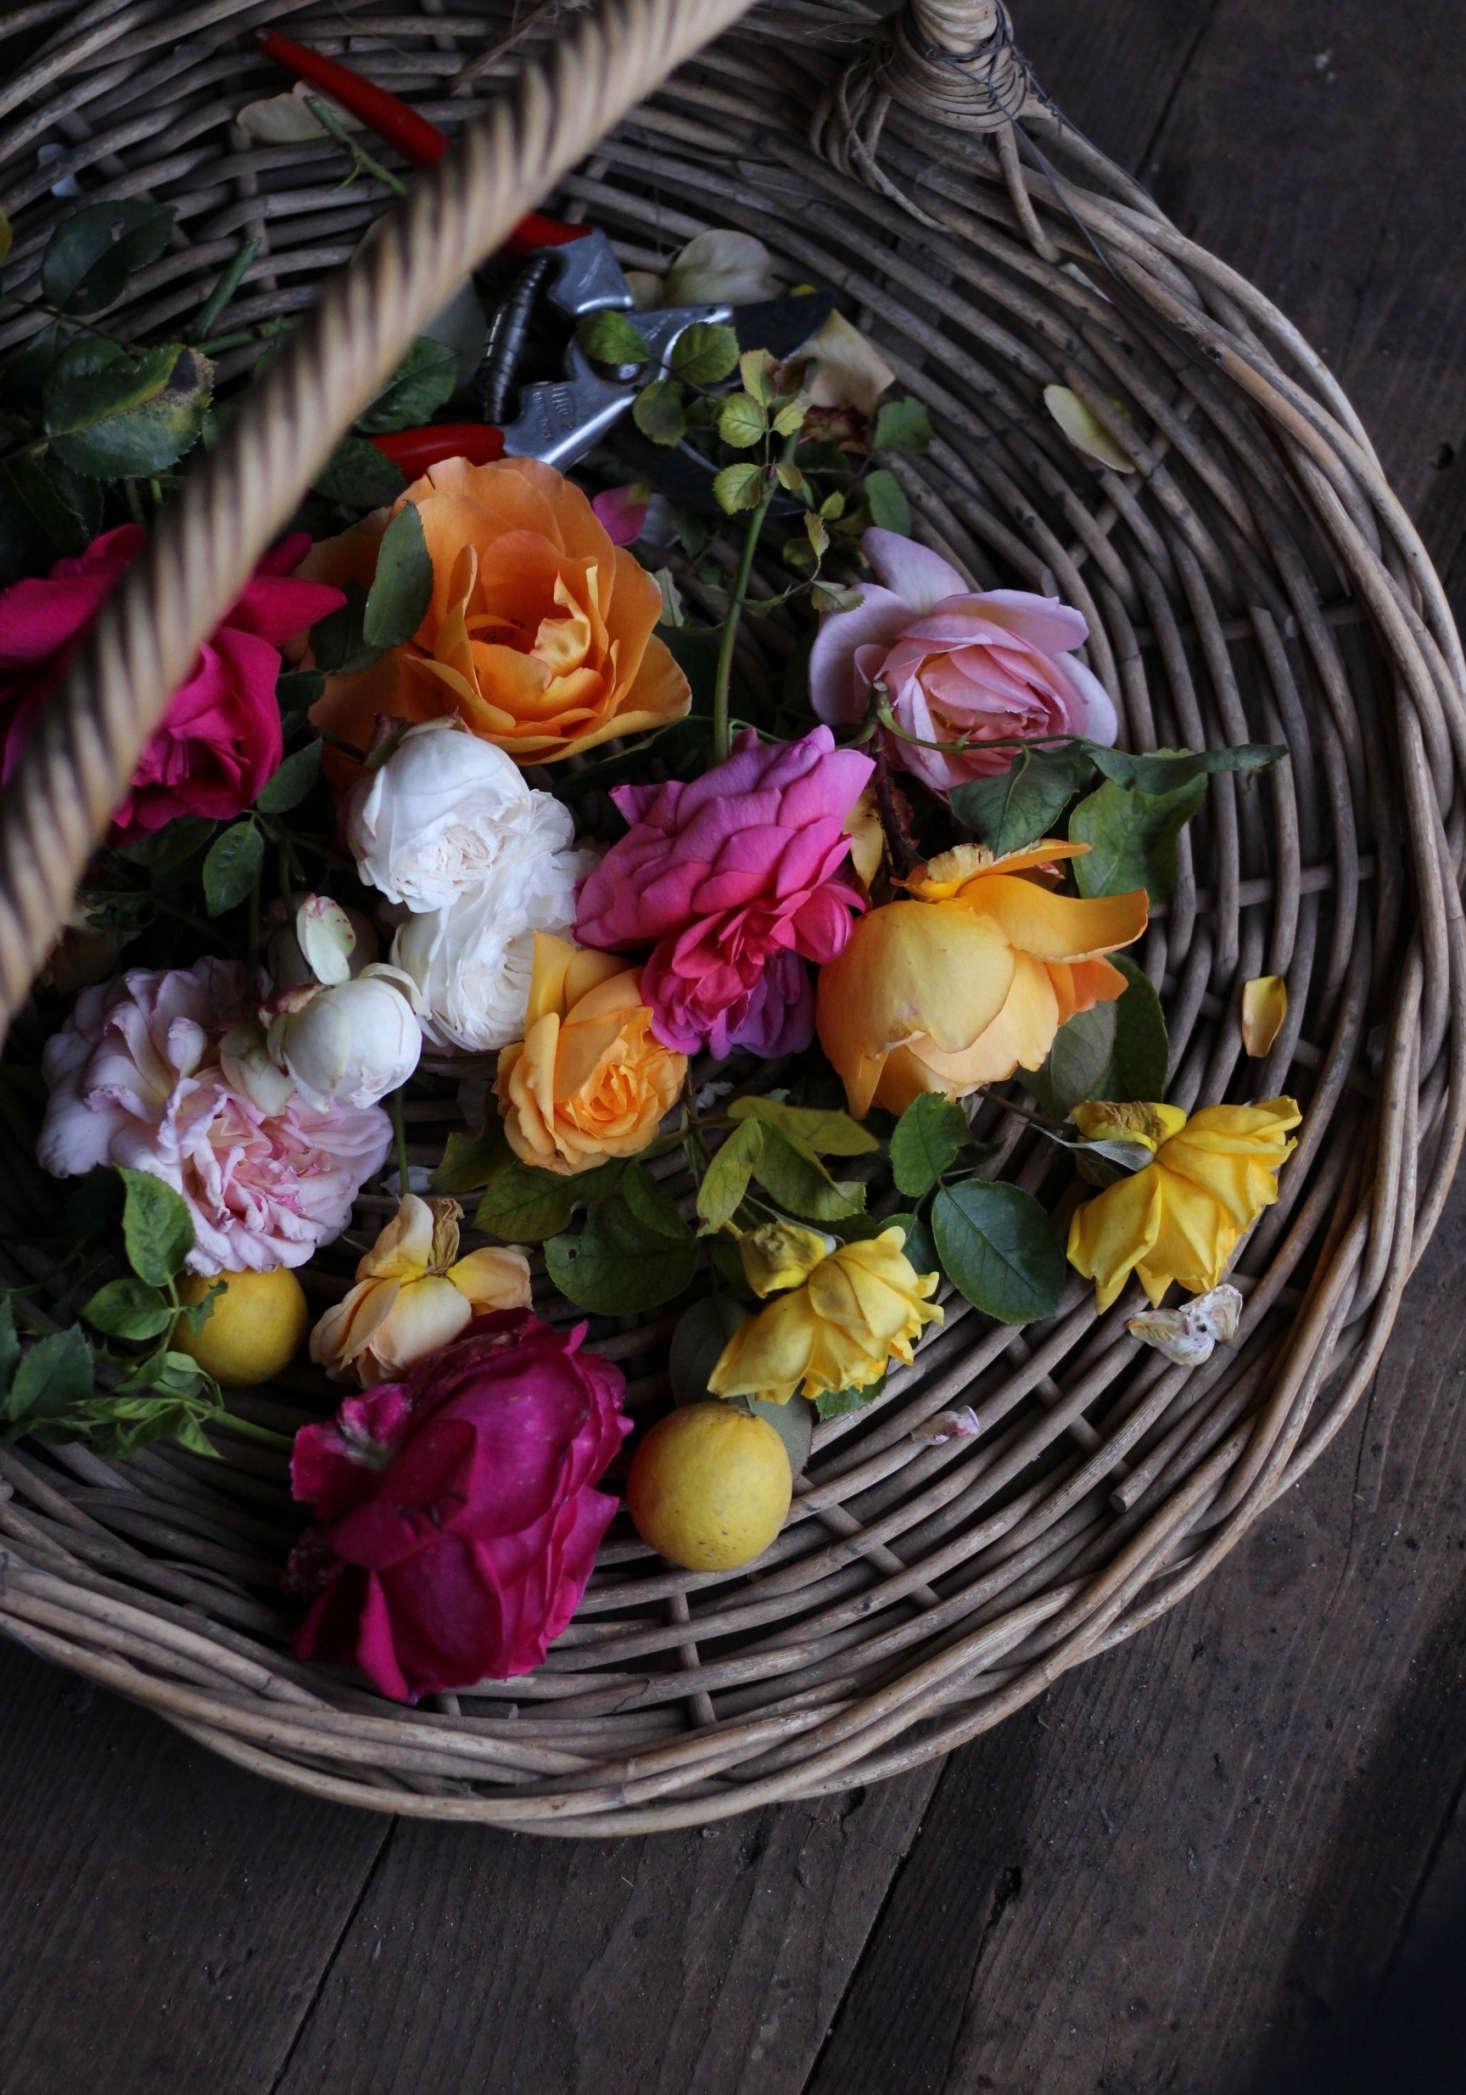 'Julia Child' at center. Danielle uses open flat baskets when harvesting.